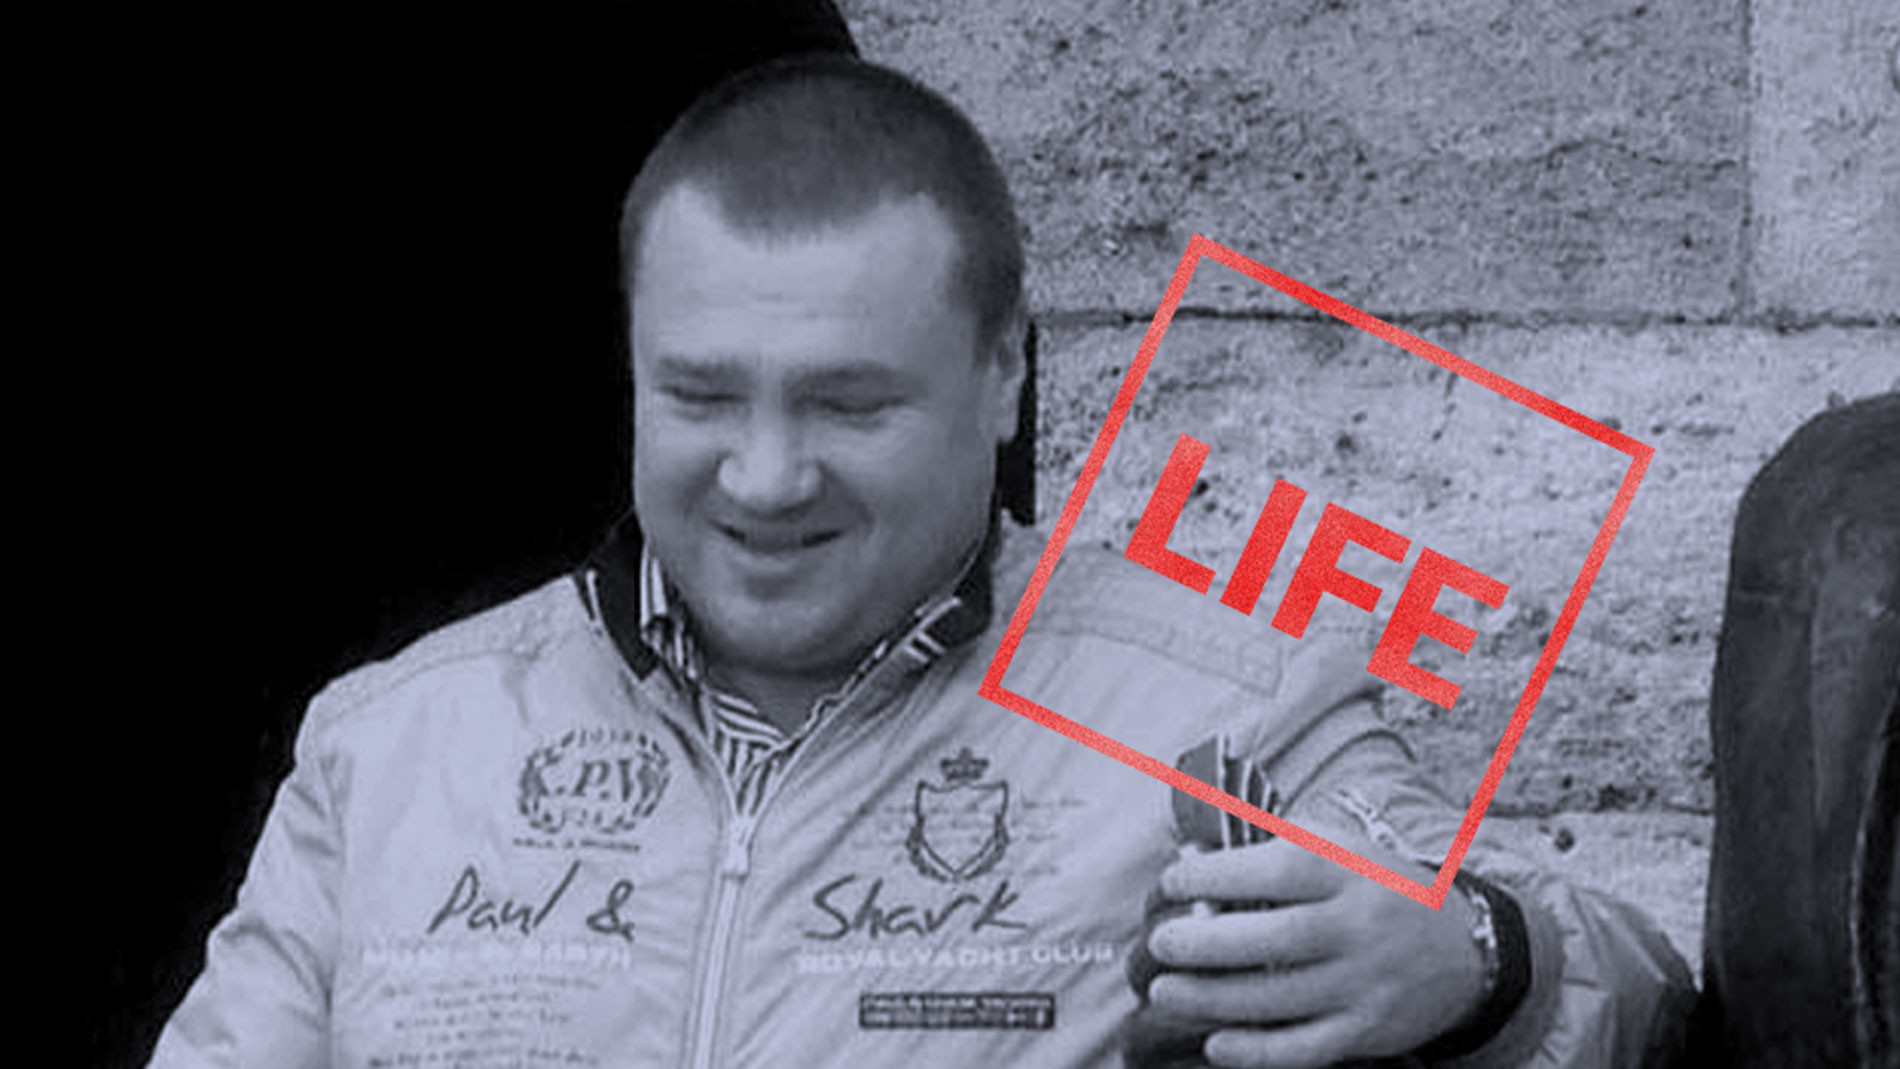 "<p>Сергей Беляков. Фото © <a href=""https://www.facebook.com/1929903137332639/photos/a.1929903160665970/1929903170665969/?type=3&theater"" target=""_self"">Facebook / Сергей Беляков</a></p>"